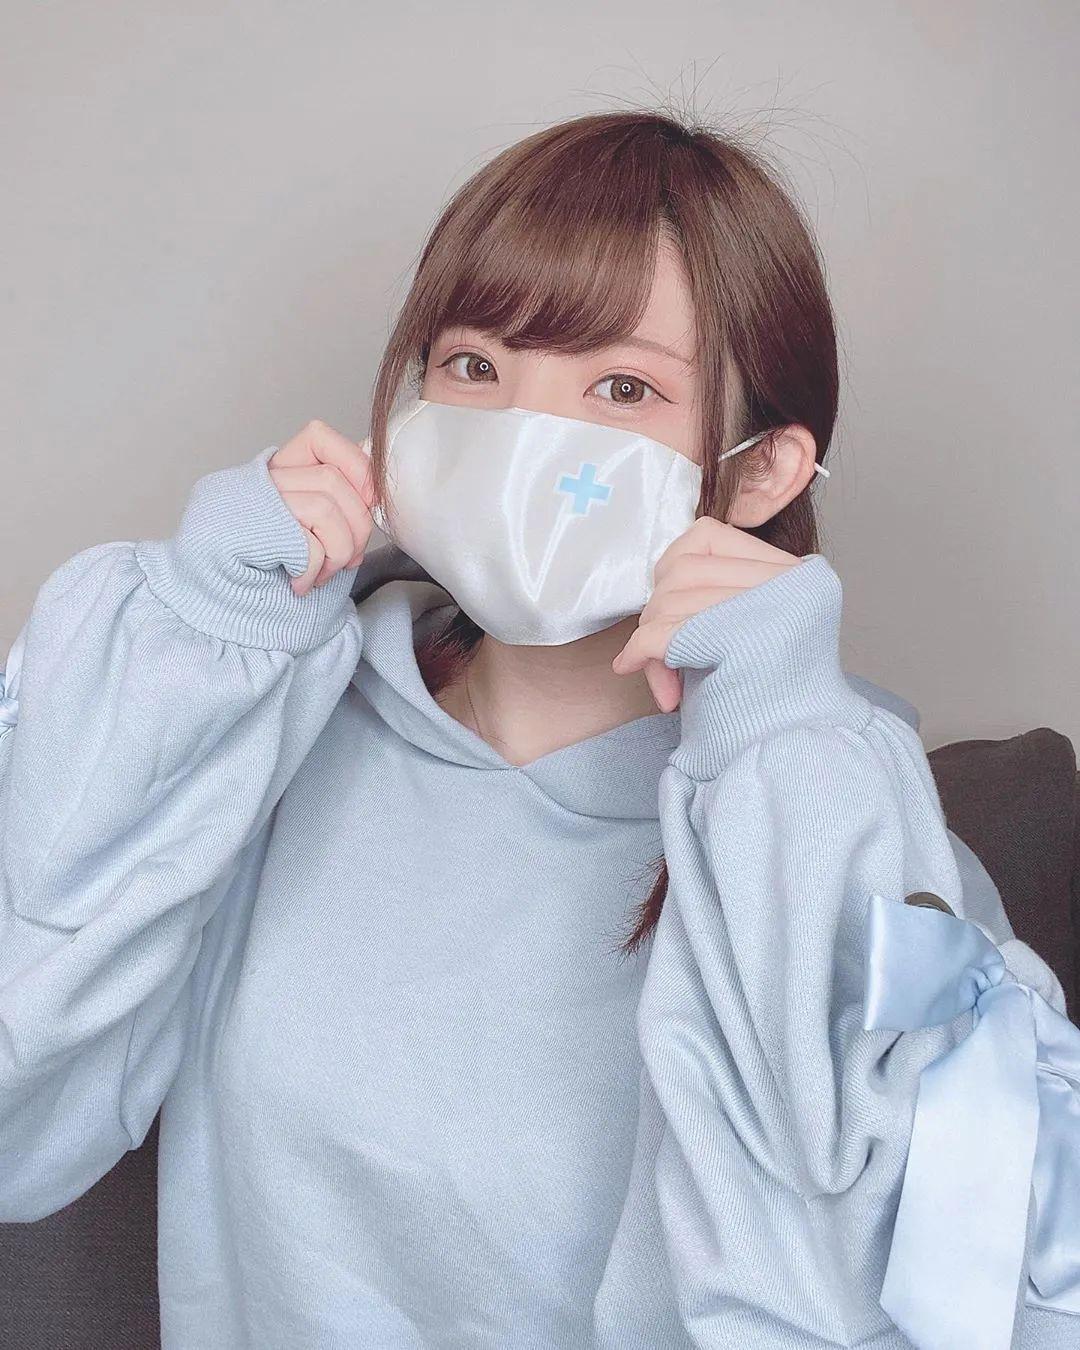 日本第一coser(Enako) Instagram:enakorin日常照及coser照_图片 No.4